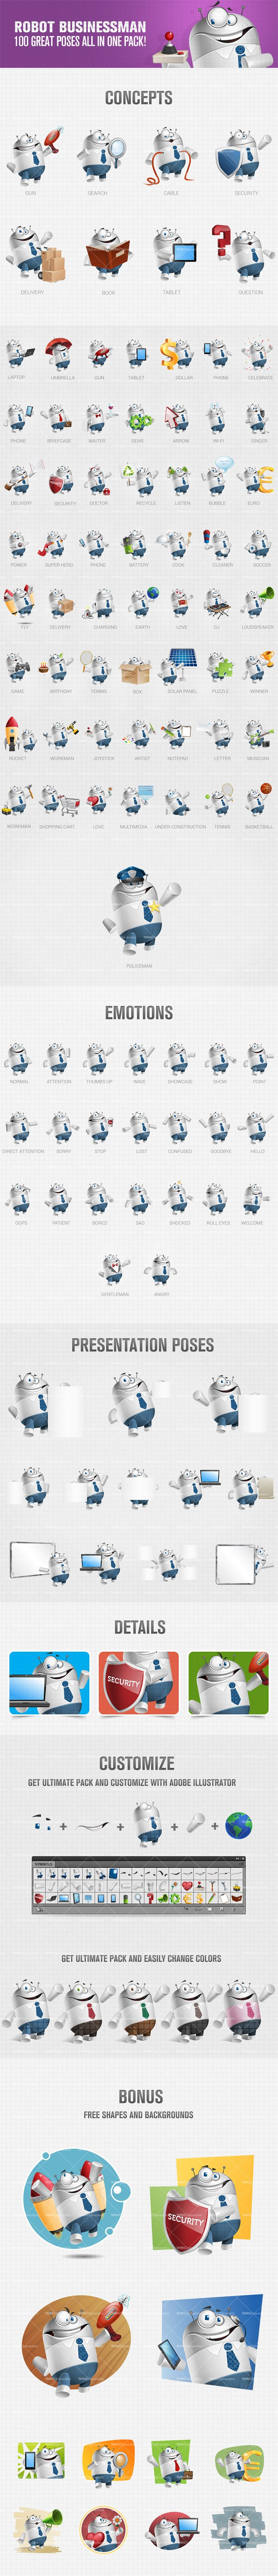 Chubby Robot Cartoon